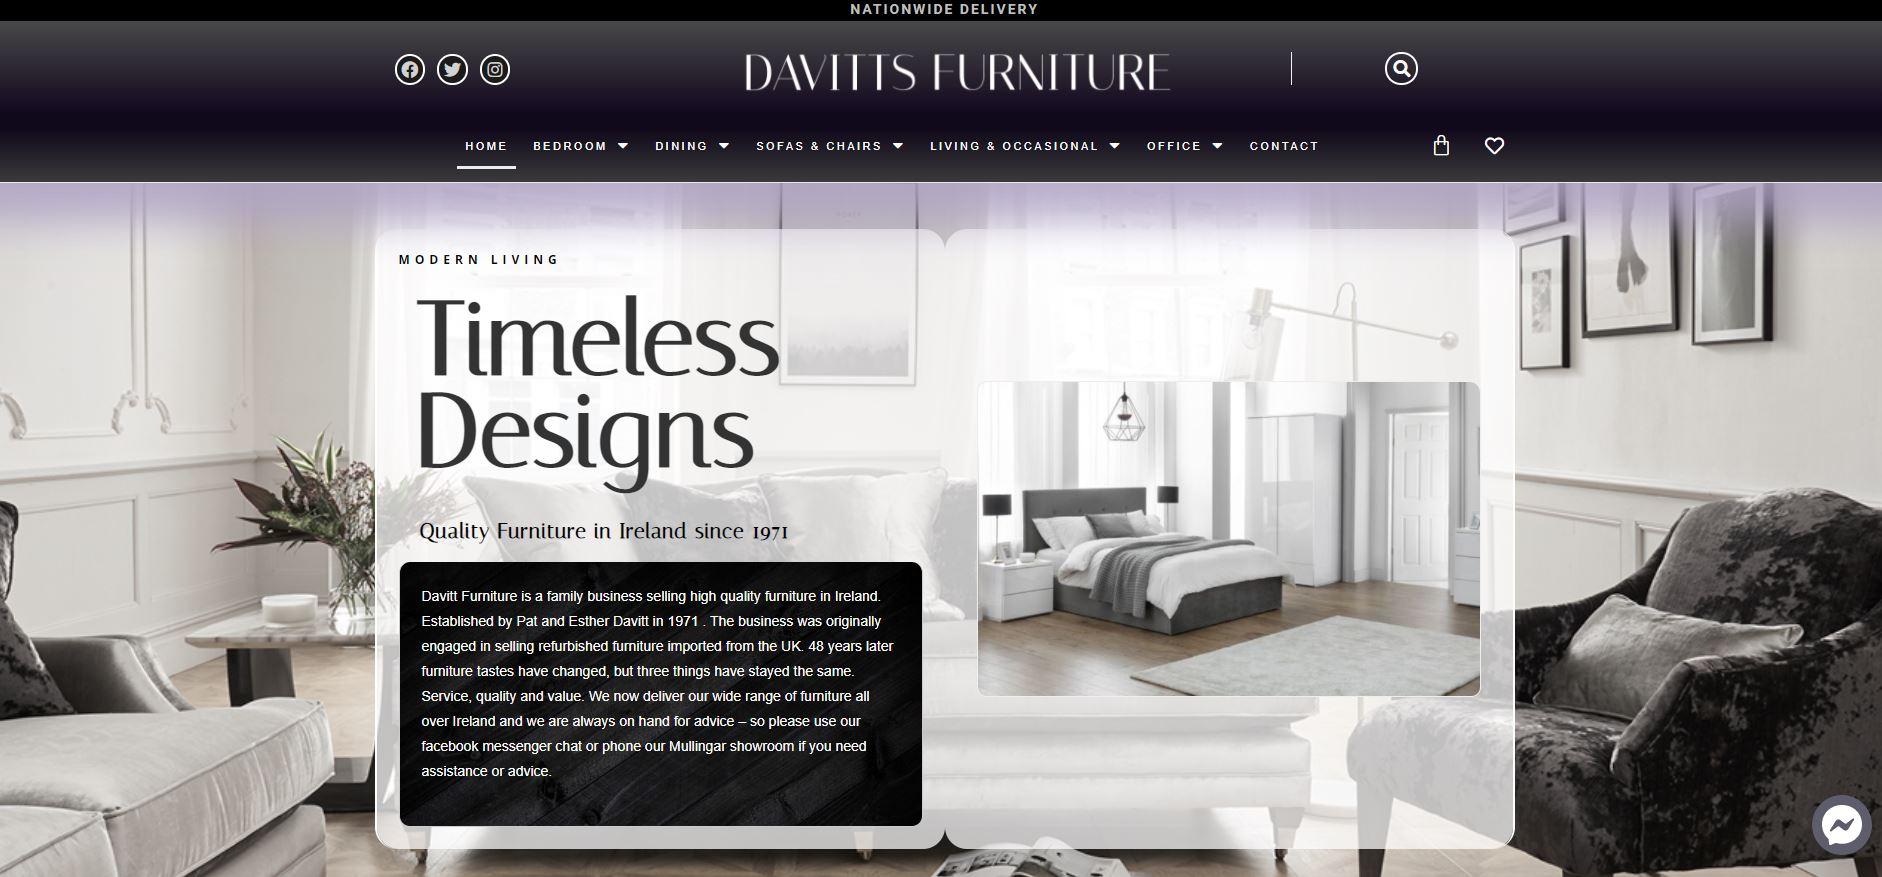 Davitts Furniture